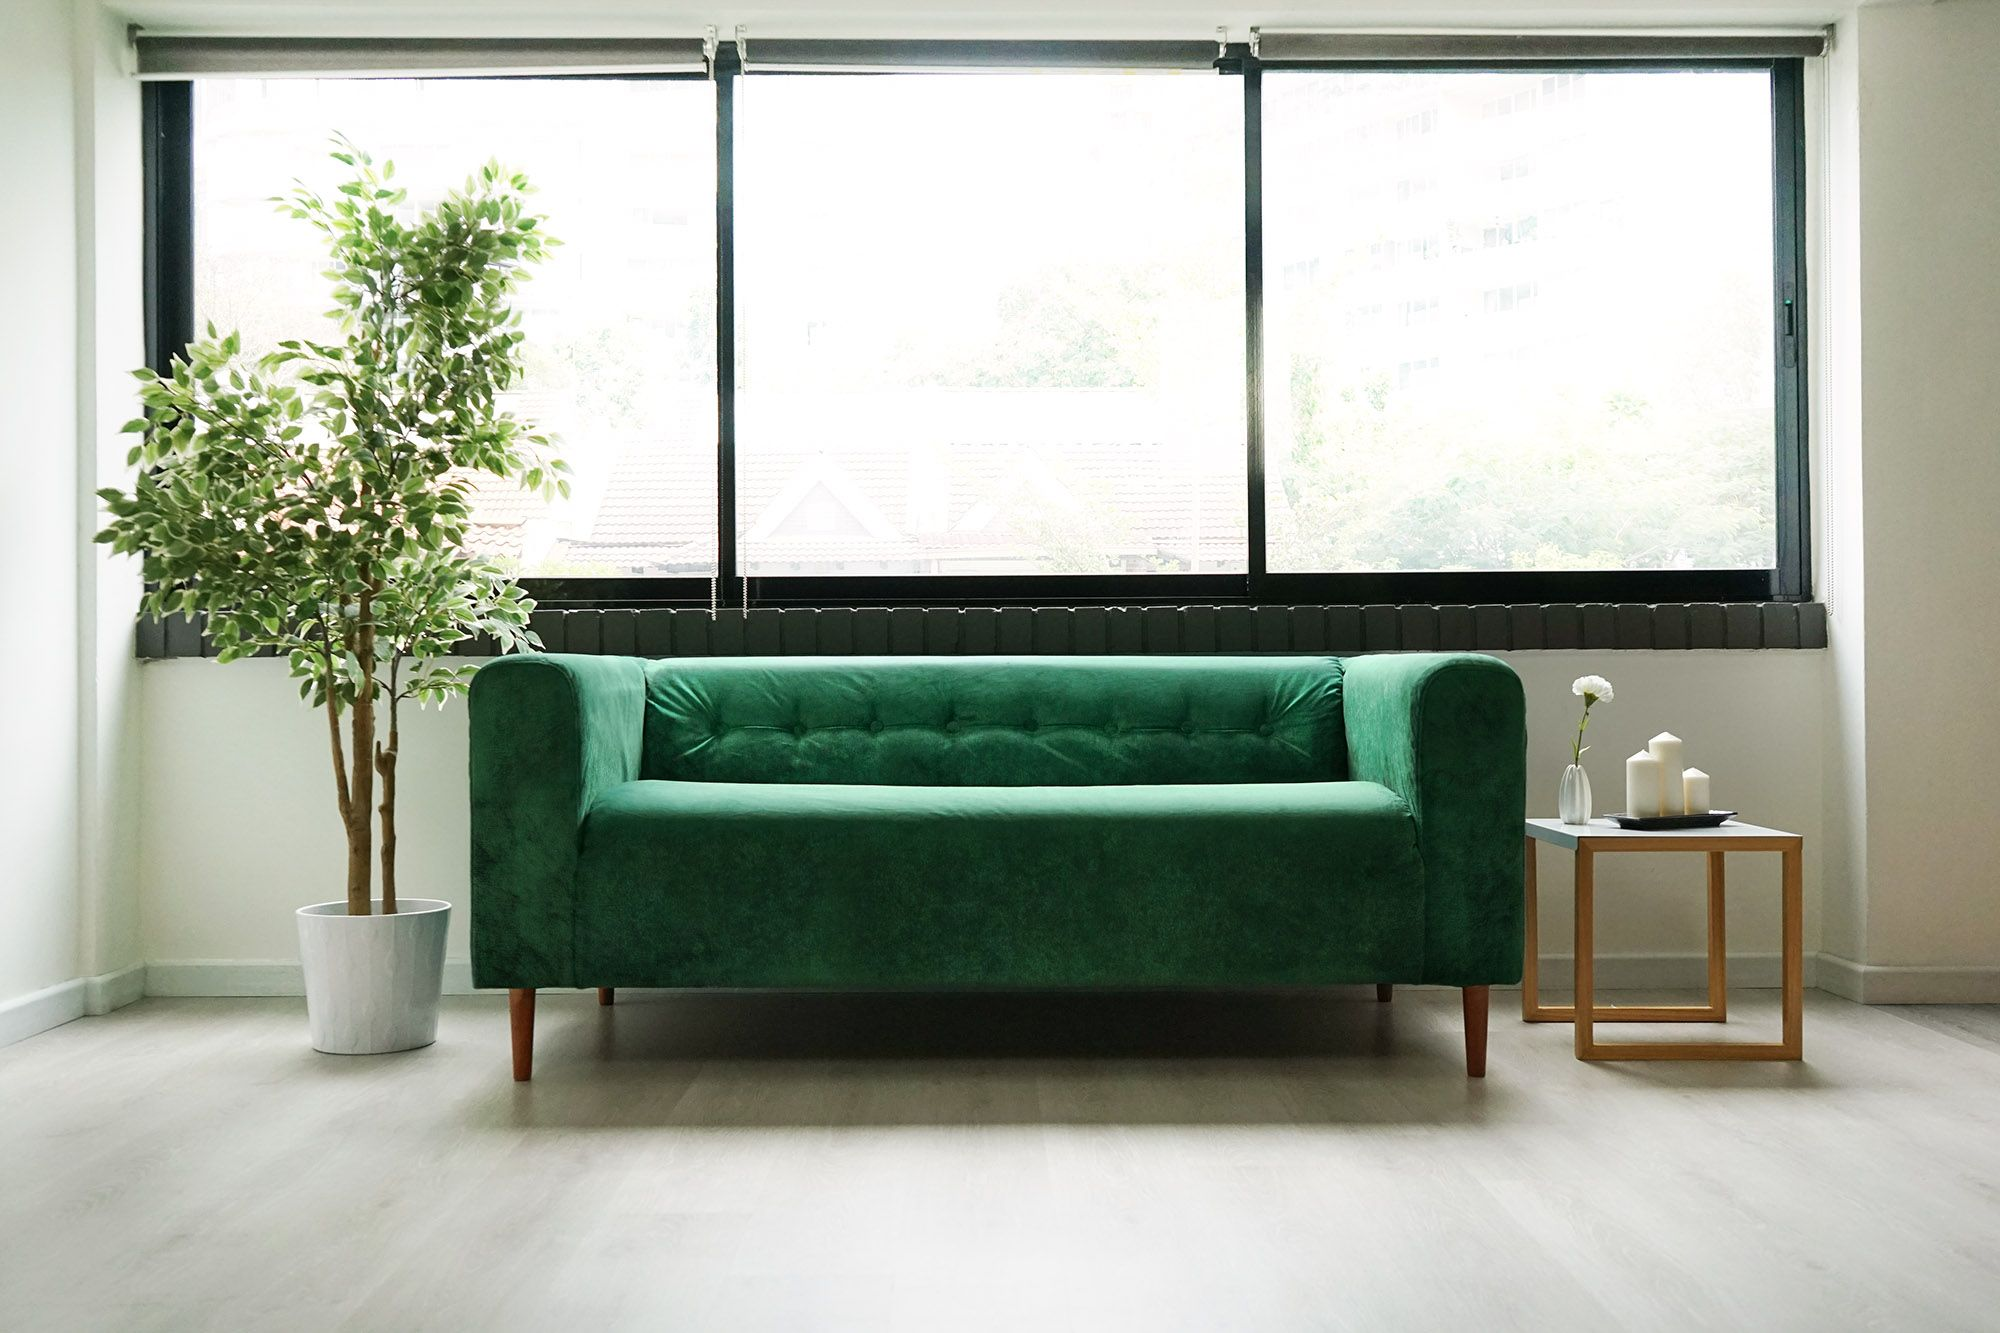 Tufting Klippan Hack Be Emerald Green With Envy Ikea Klippan Sofa Ikea Sofa Diy Sofa Cover